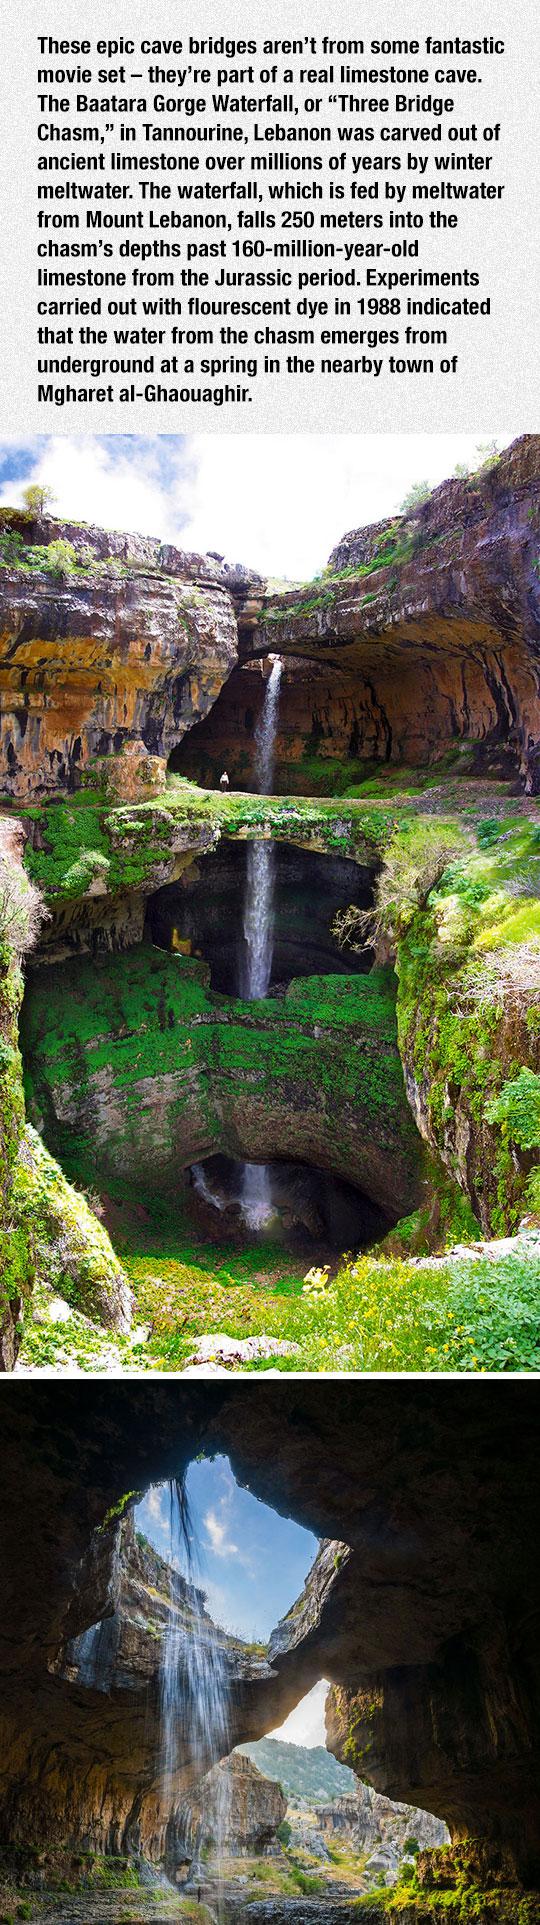 cool-cave-three-bridges-waterfall